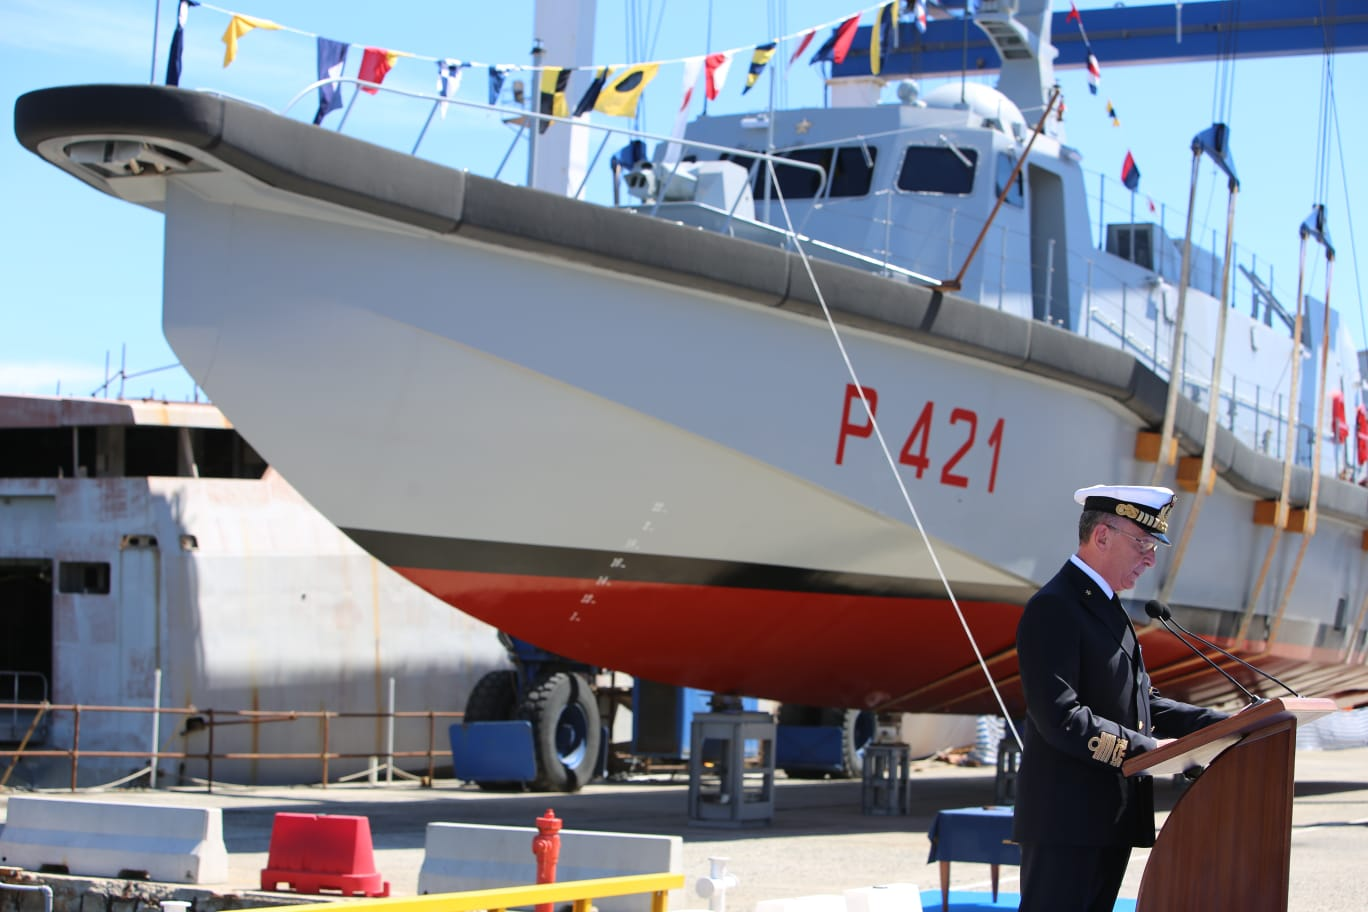 Varate due nuove navi della Marina a Messina